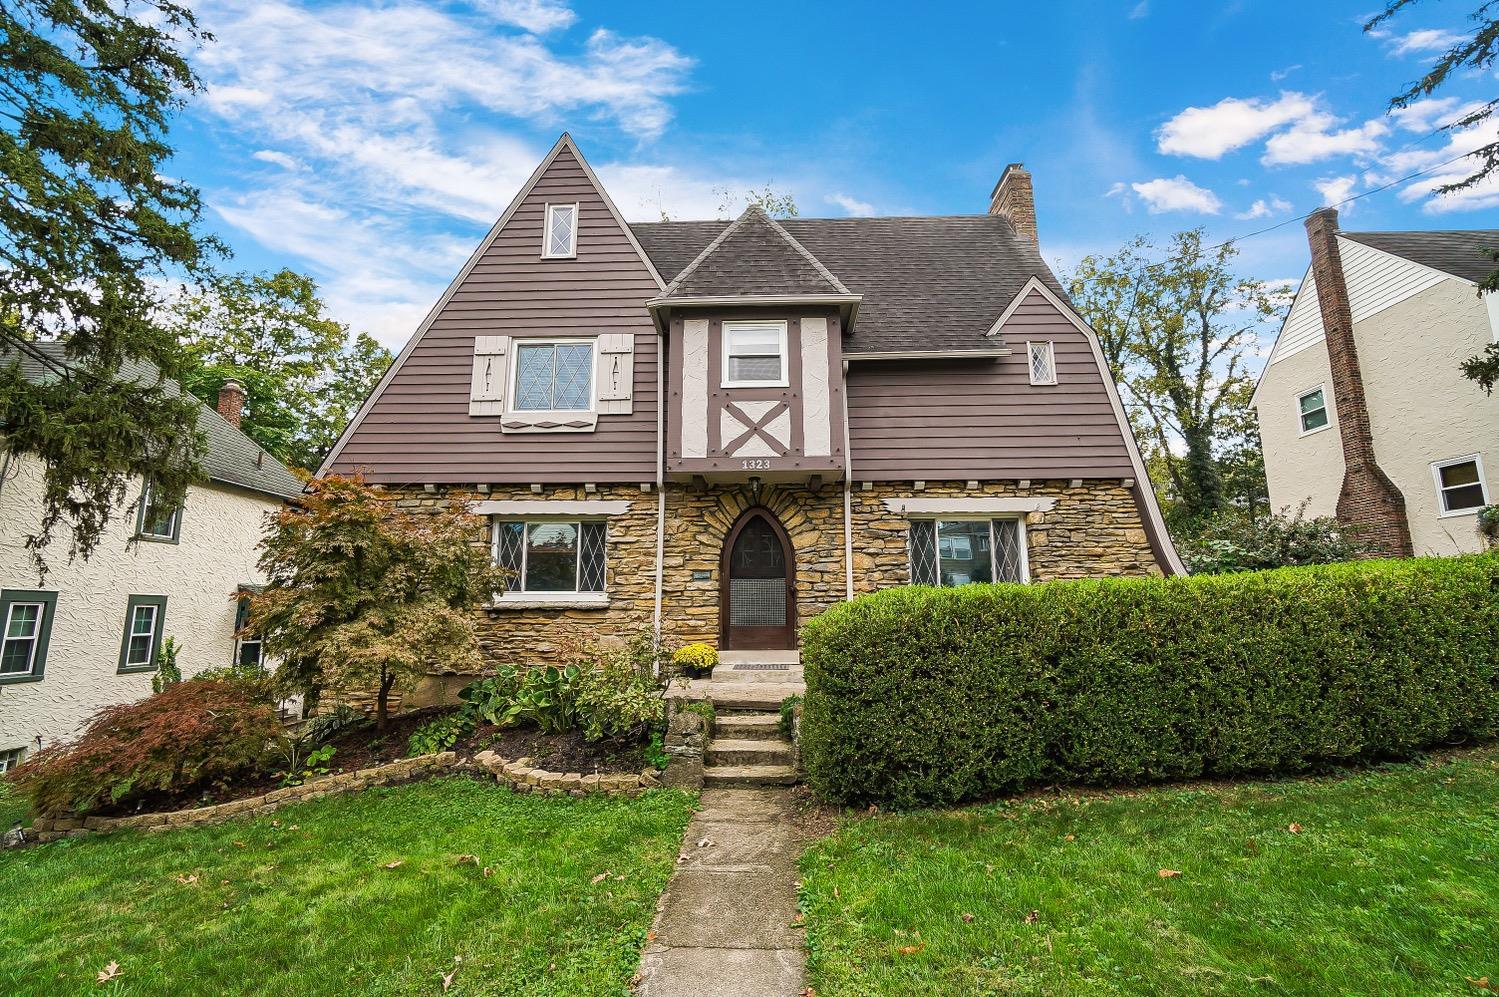 1323 Avon Drive, Cincinnati, Ohio 45229, 3 Bedrooms Bedrooms, 10 Rooms Rooms,2 BathroomsBathrooms,Single Family Residence,For Sale,Avon,1718907